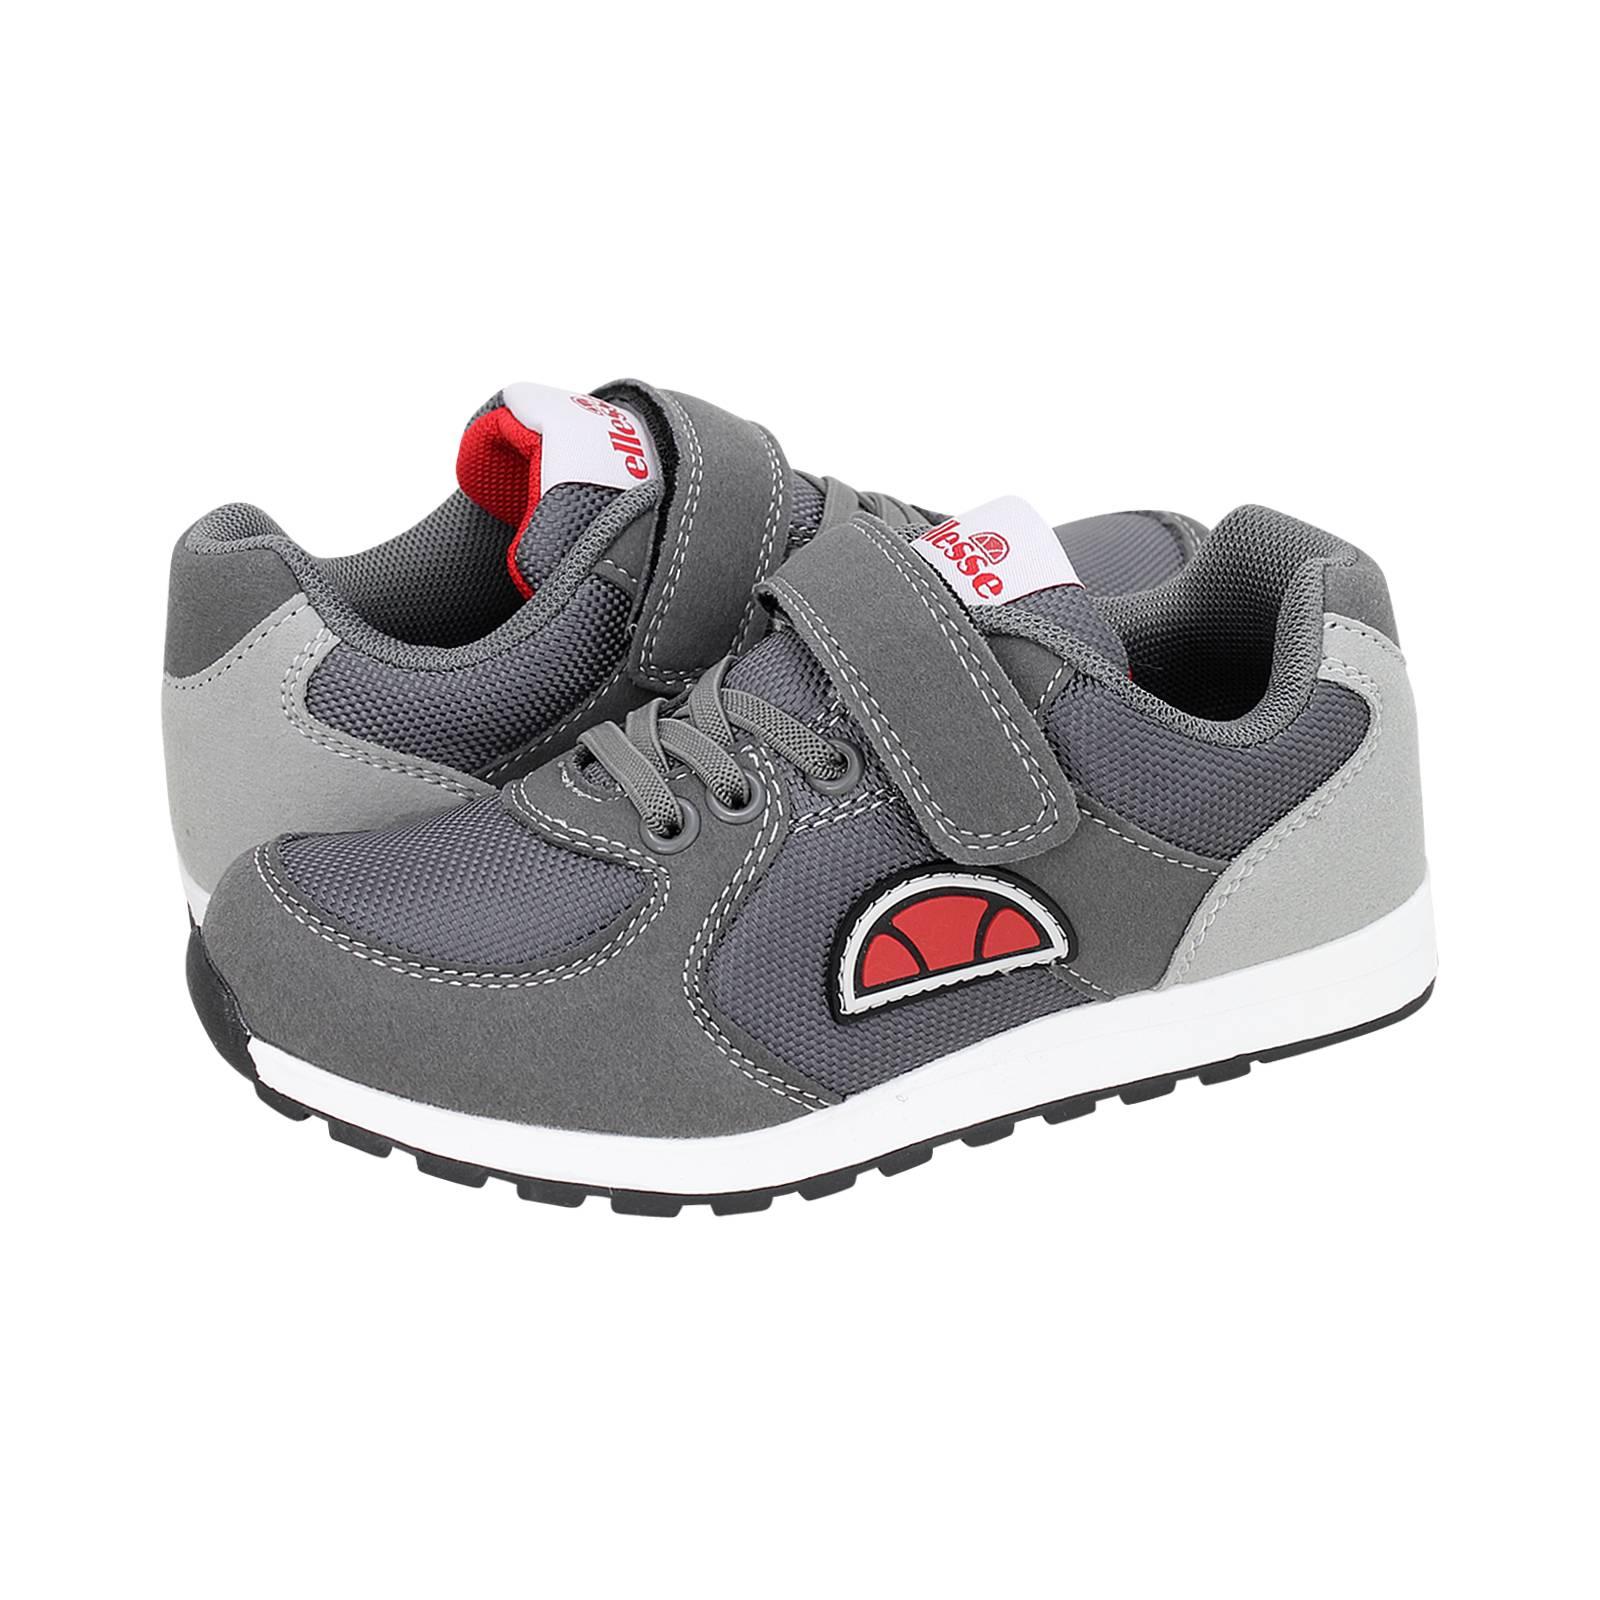 HB-ELS07 - Παιδικά αθλητικά παπούτσια Ellesse από συνθετικο και ... 9b301b6988f